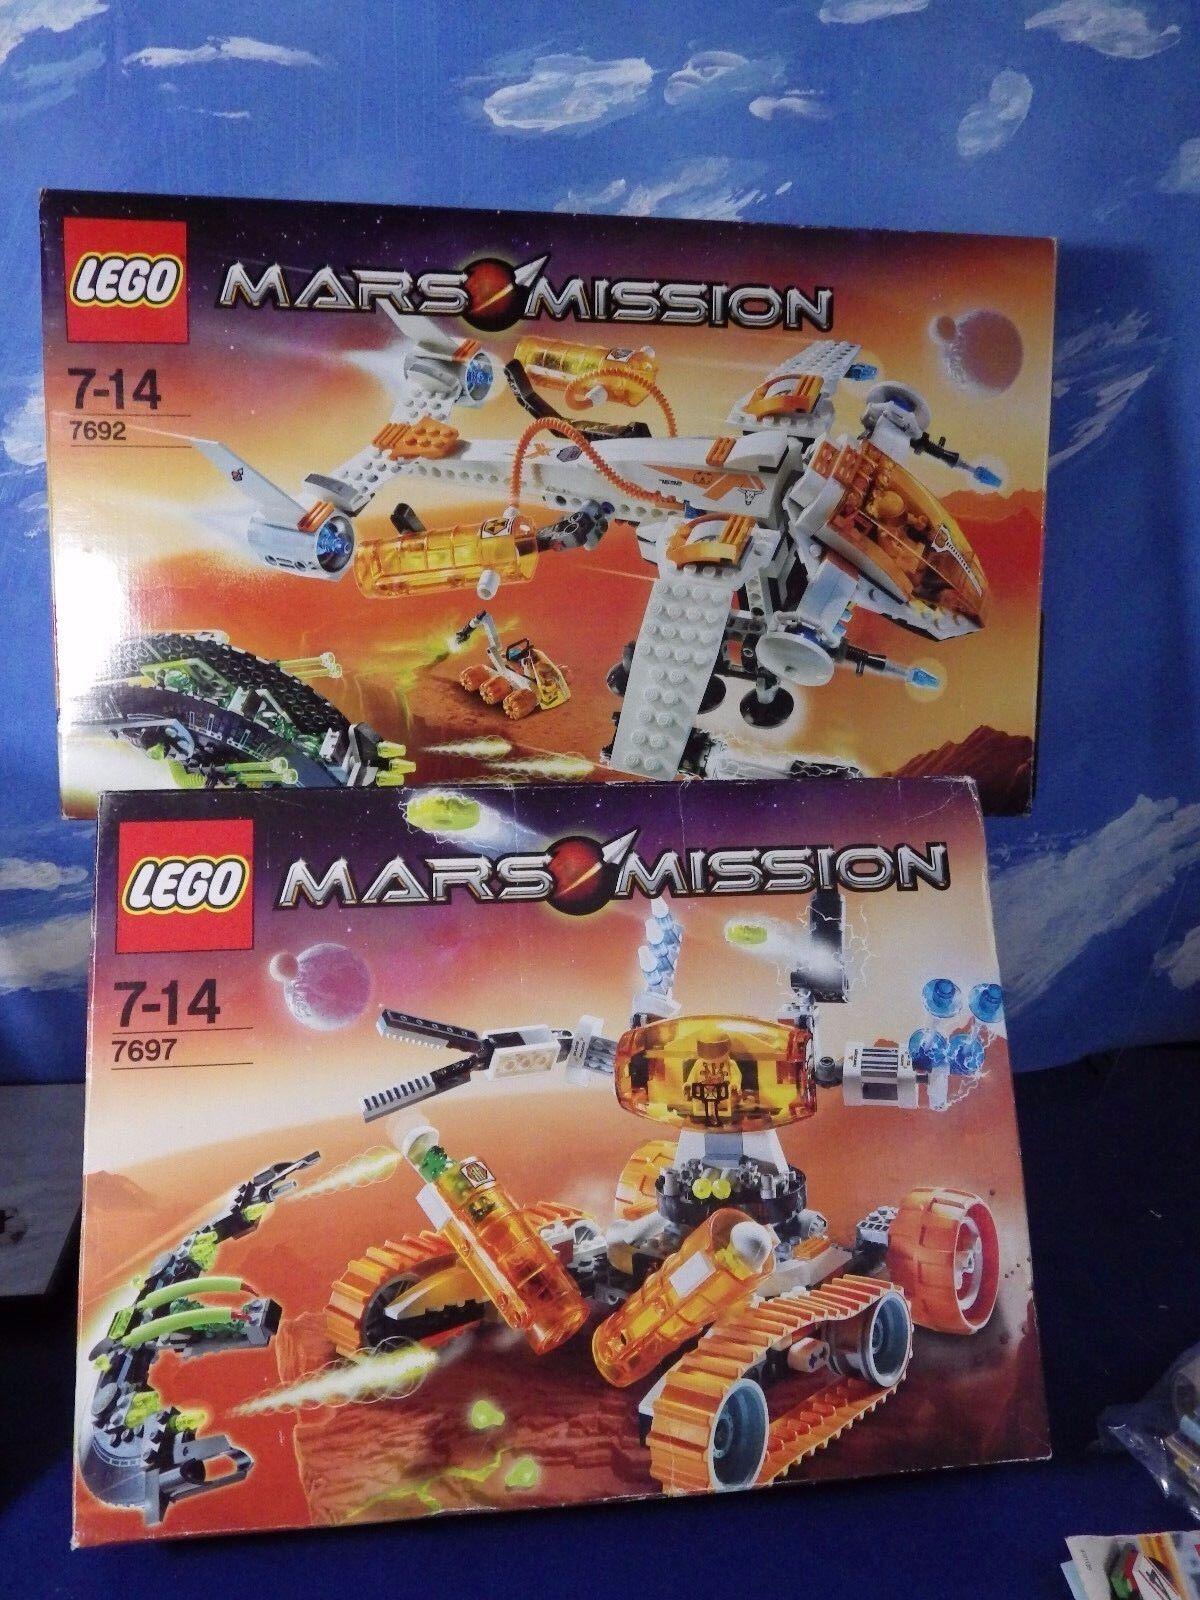 Lego 7692 & 7697 Mars Mission MX-71 Recon Dropship &  MT-51 Claw-Tank Ambush